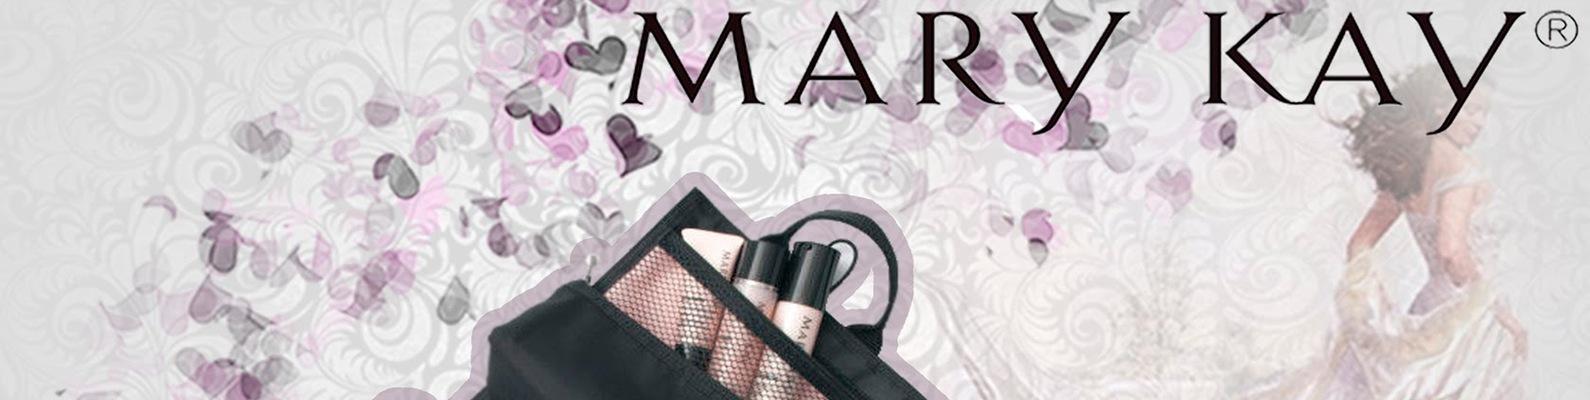 Марикей каталог декабрь в чебоксарах консультант на дому — pic 3